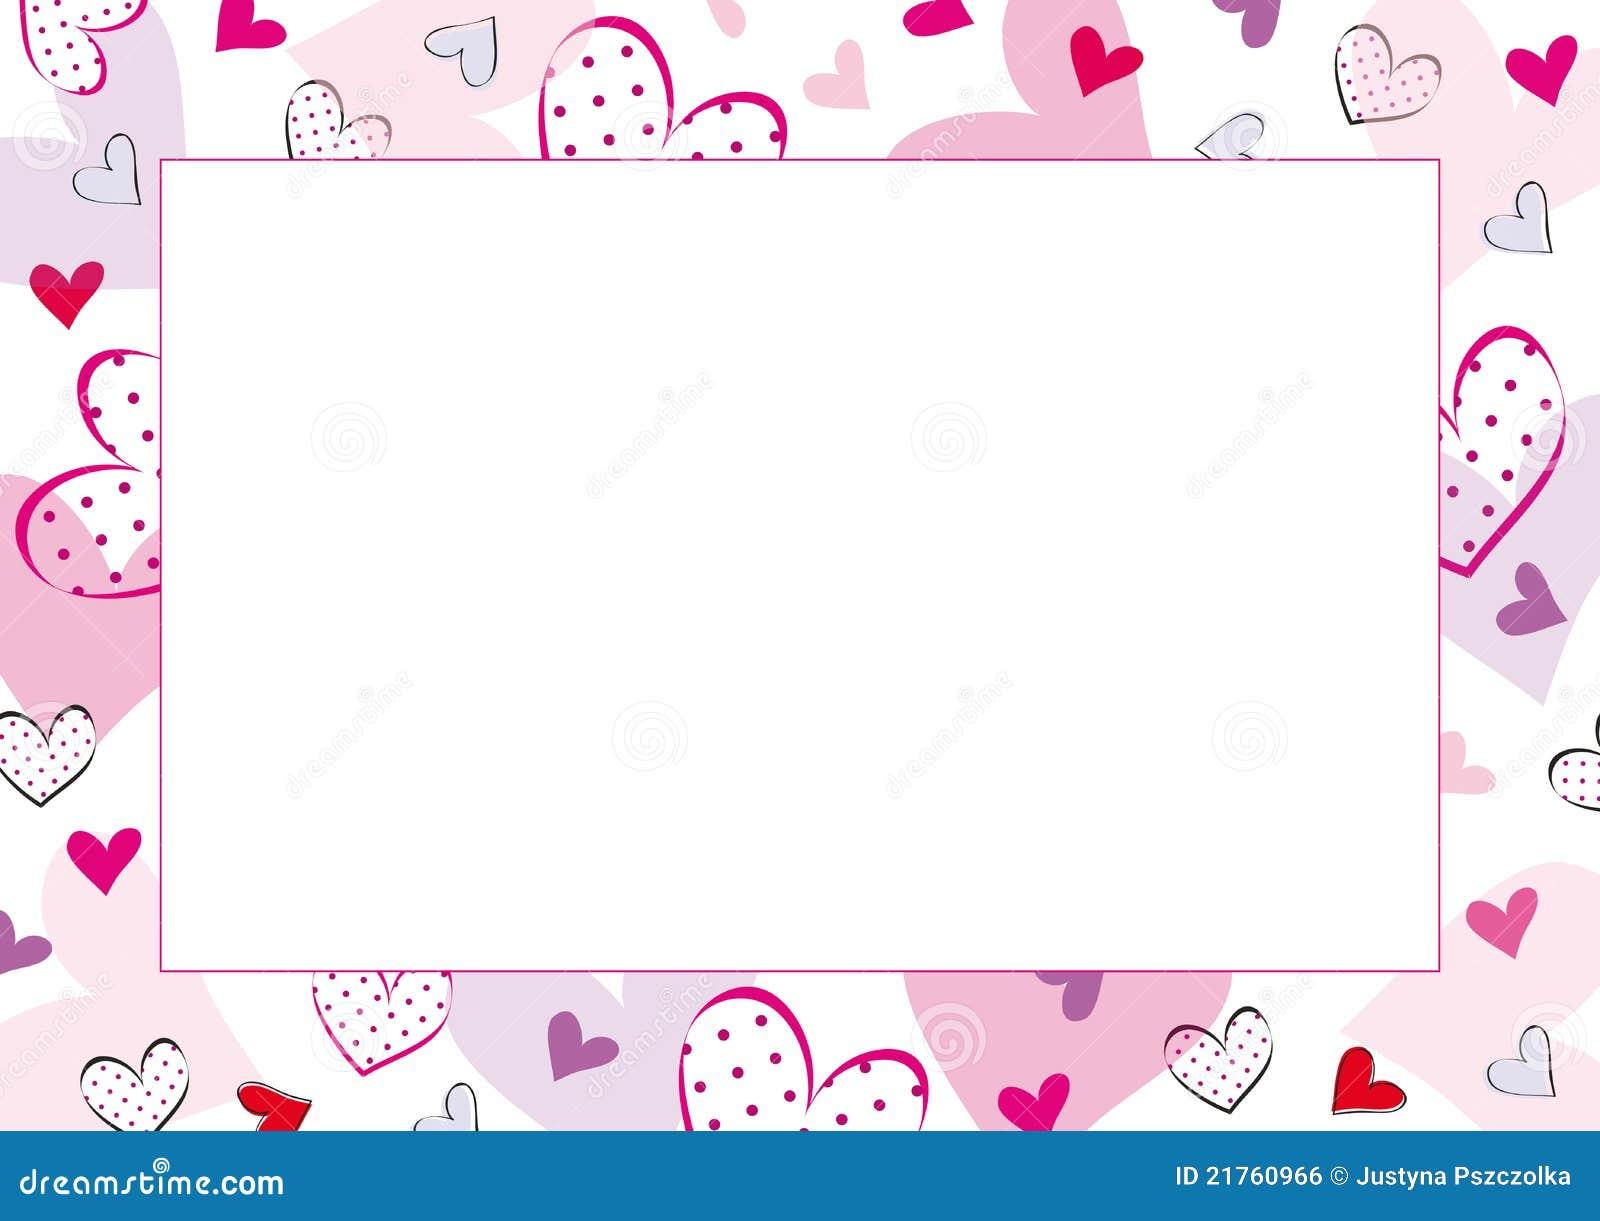 Valentines Or Wedding Frame Stock Vector - Illustration of dots ...